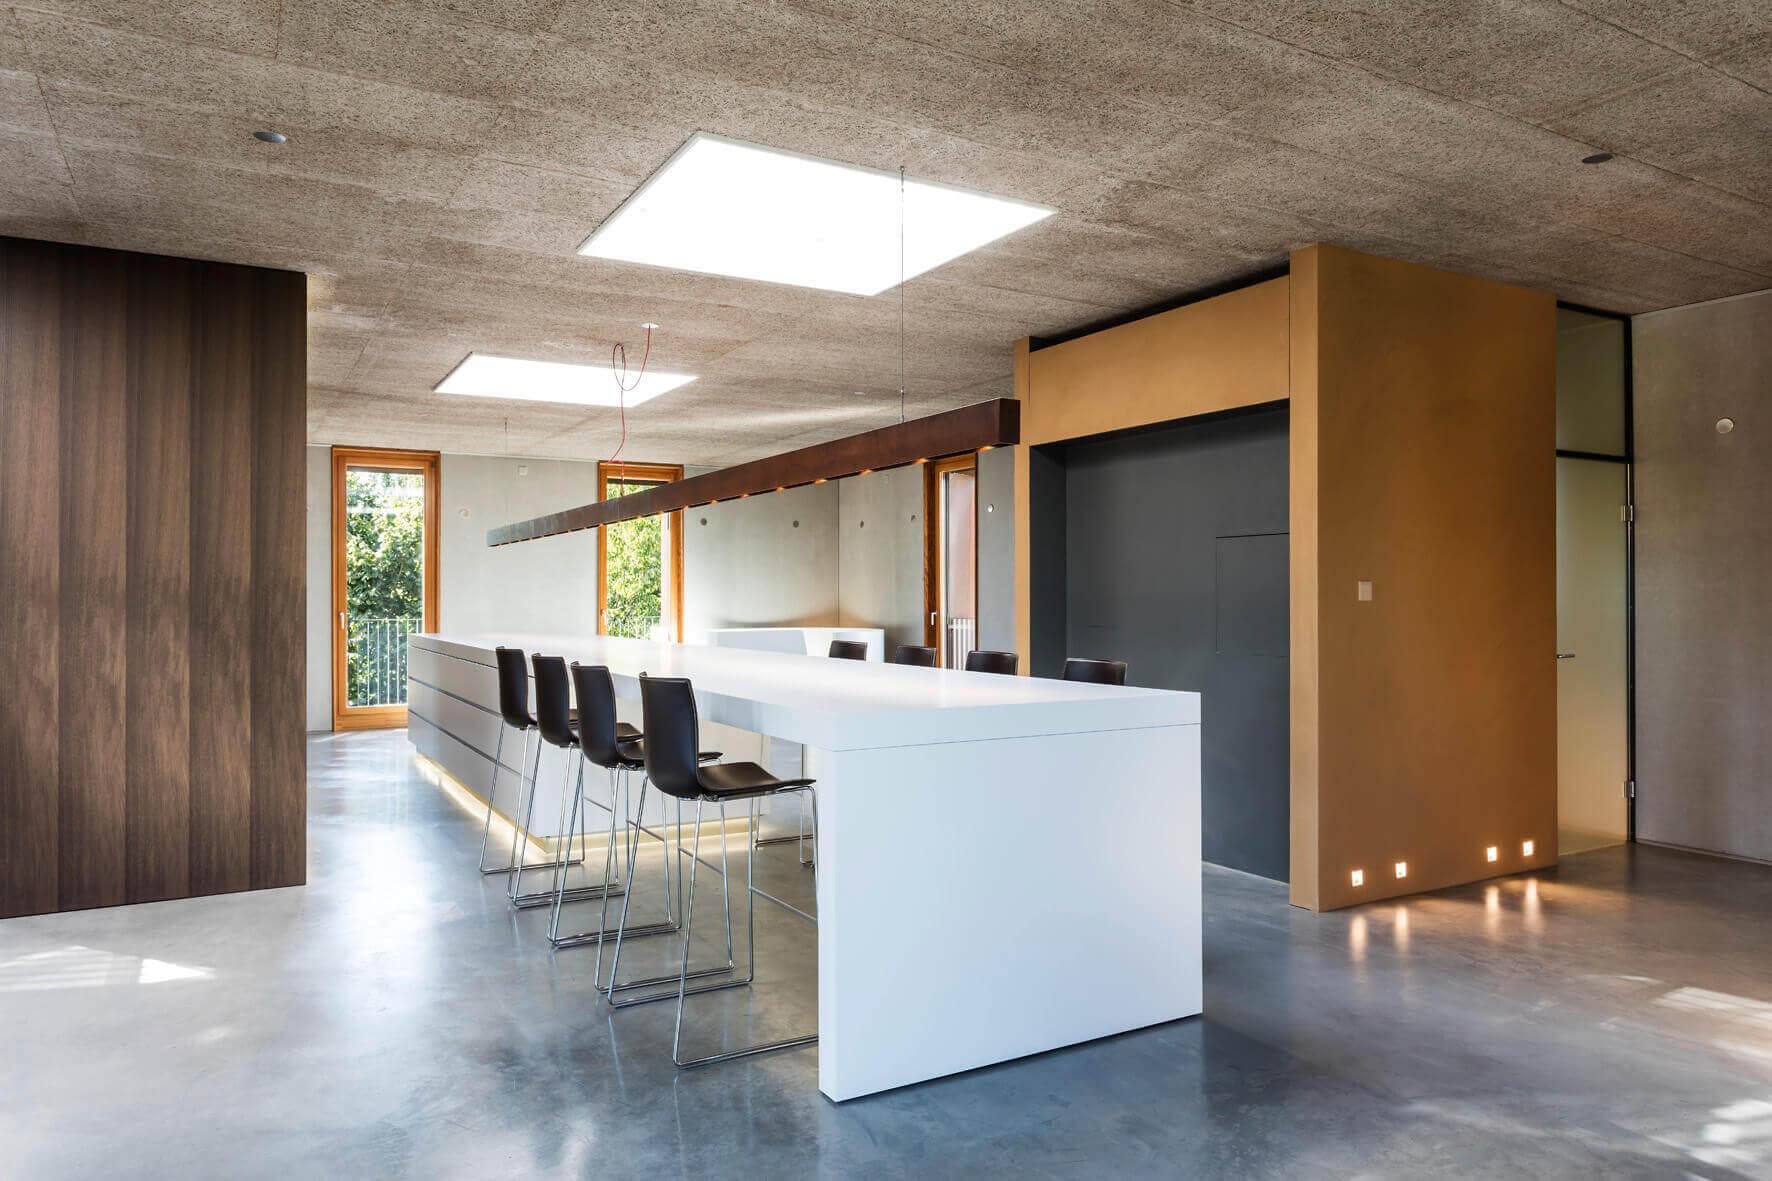 Küche loft foto rené lamb planung isoluzioni möbel minimal